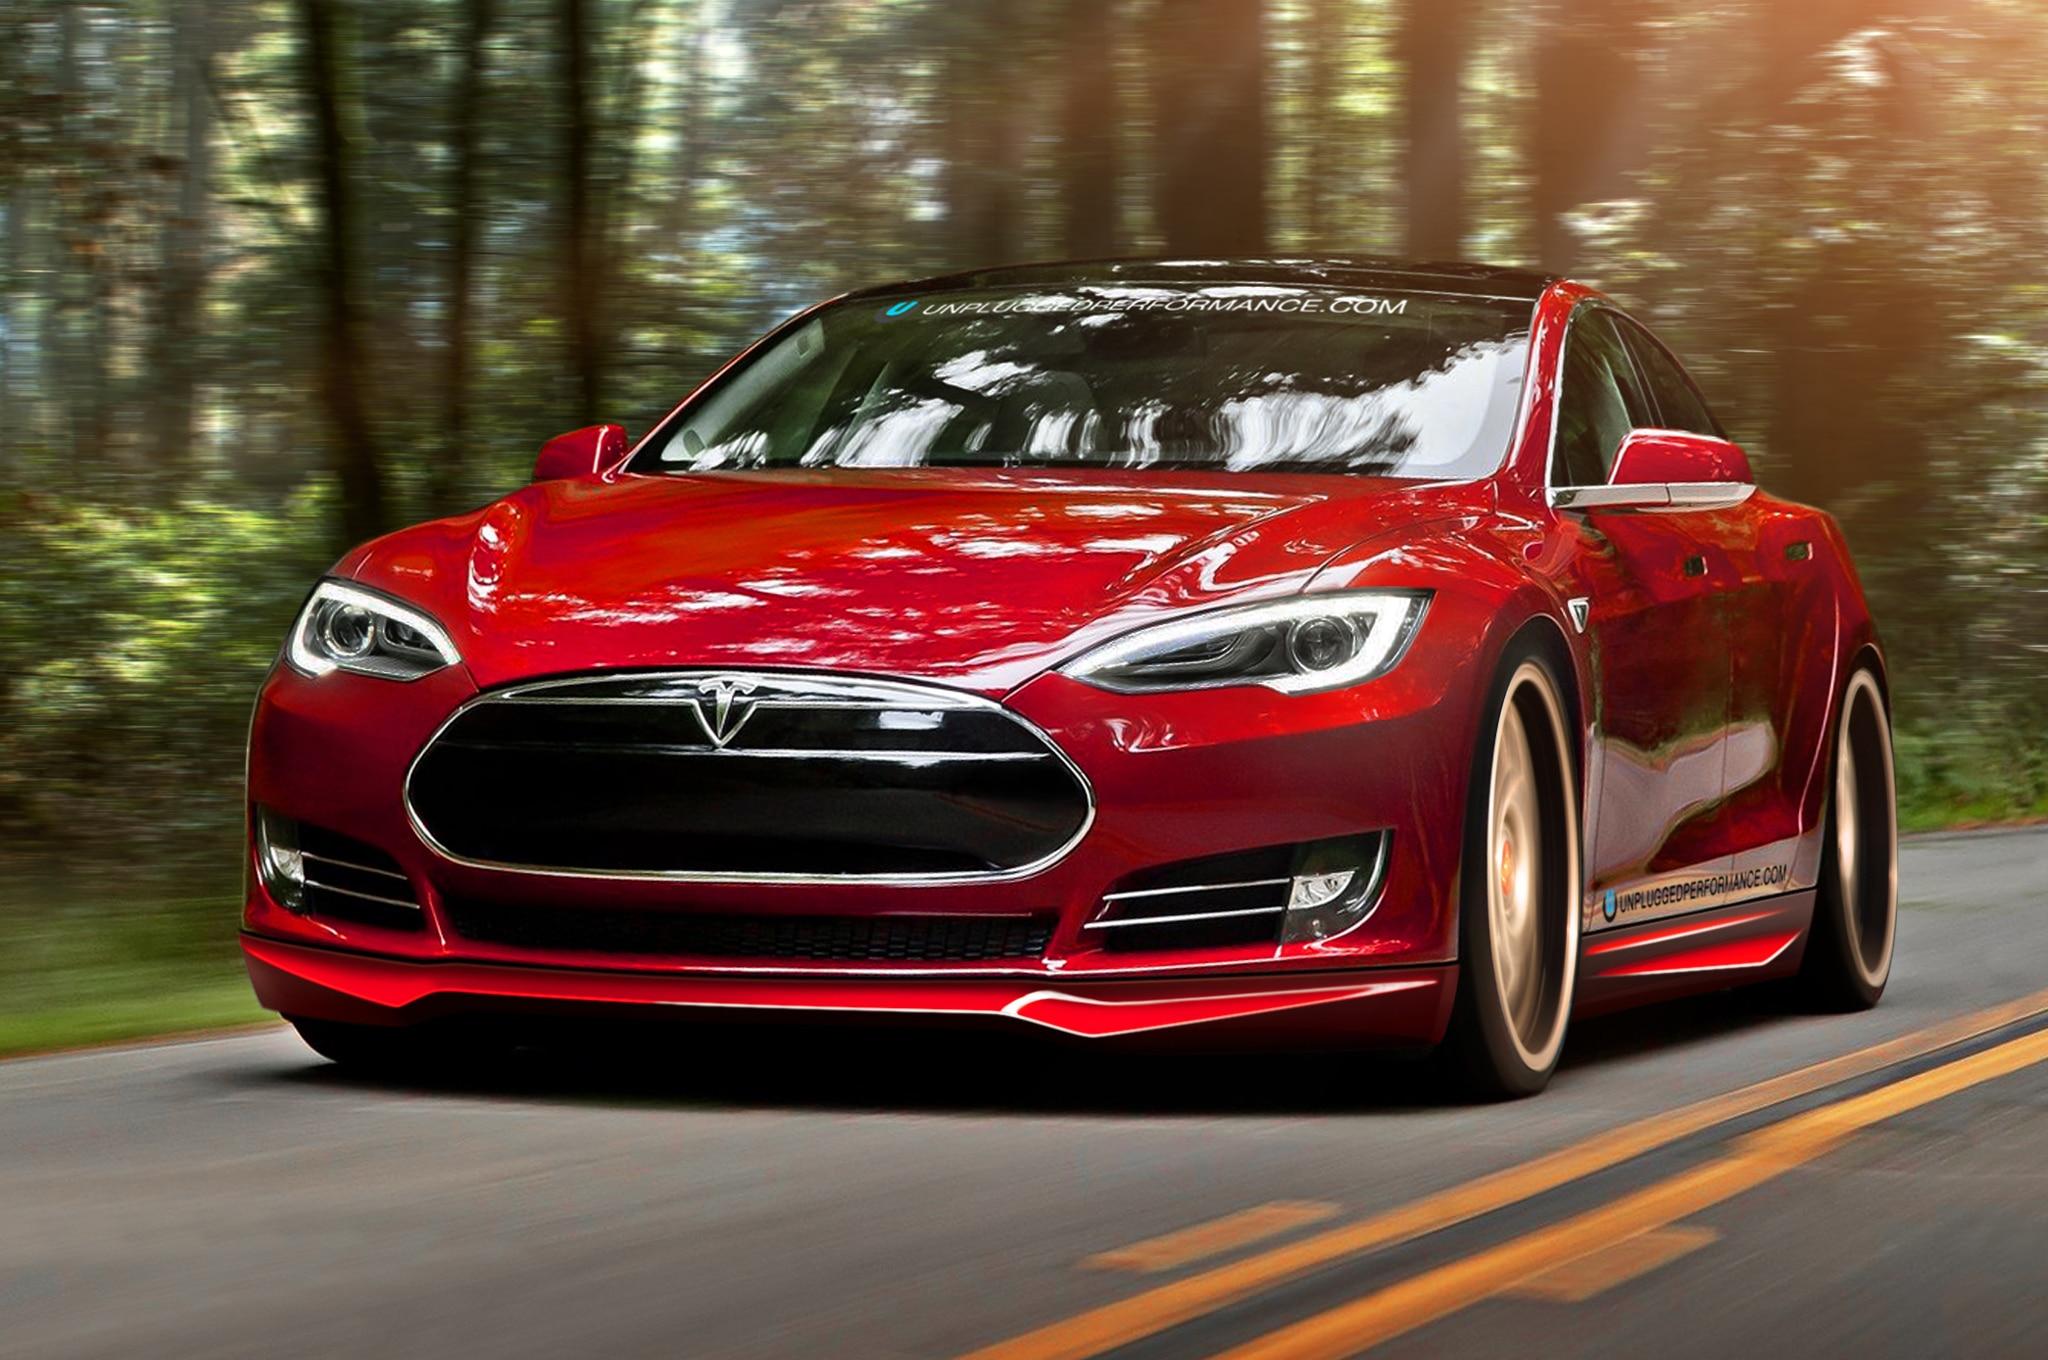 Tuner Launches Tesla Model S Body Kit – Automobile Magazine